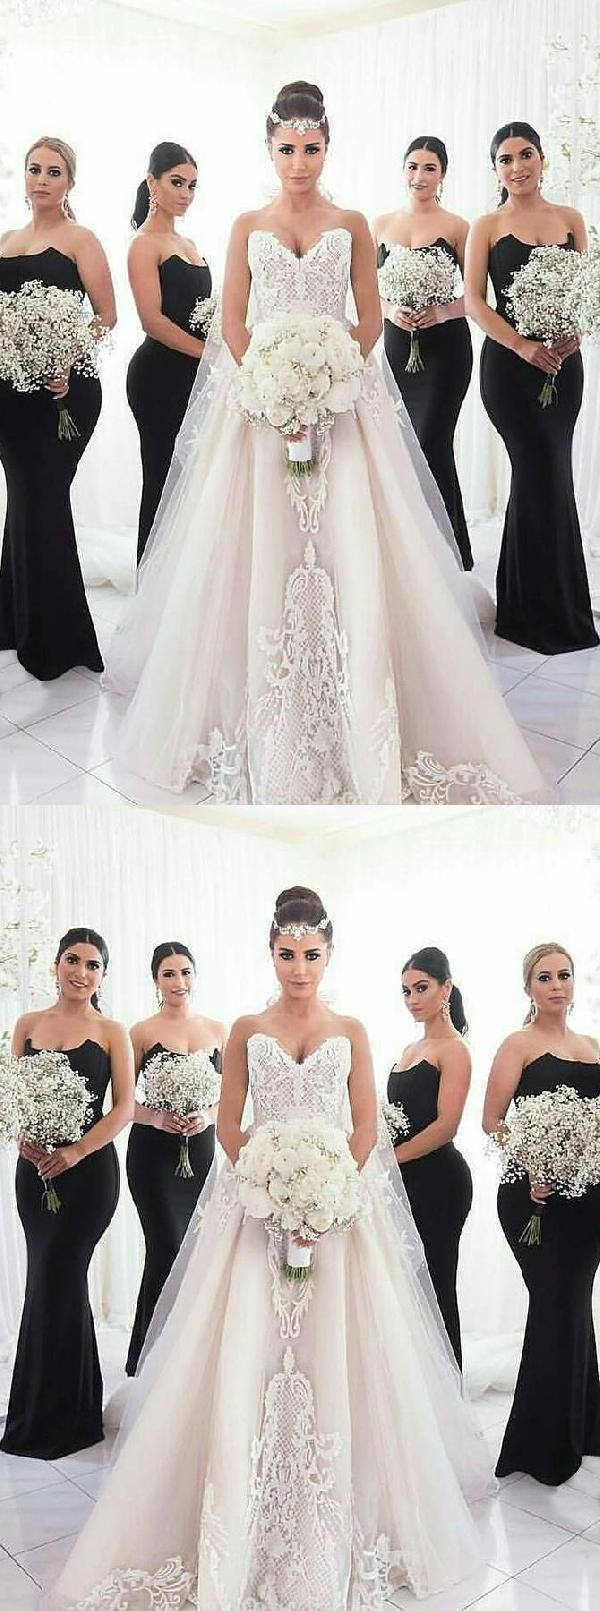 Appealing black mermaid bridesmaid dresses black bridesmaid dresses